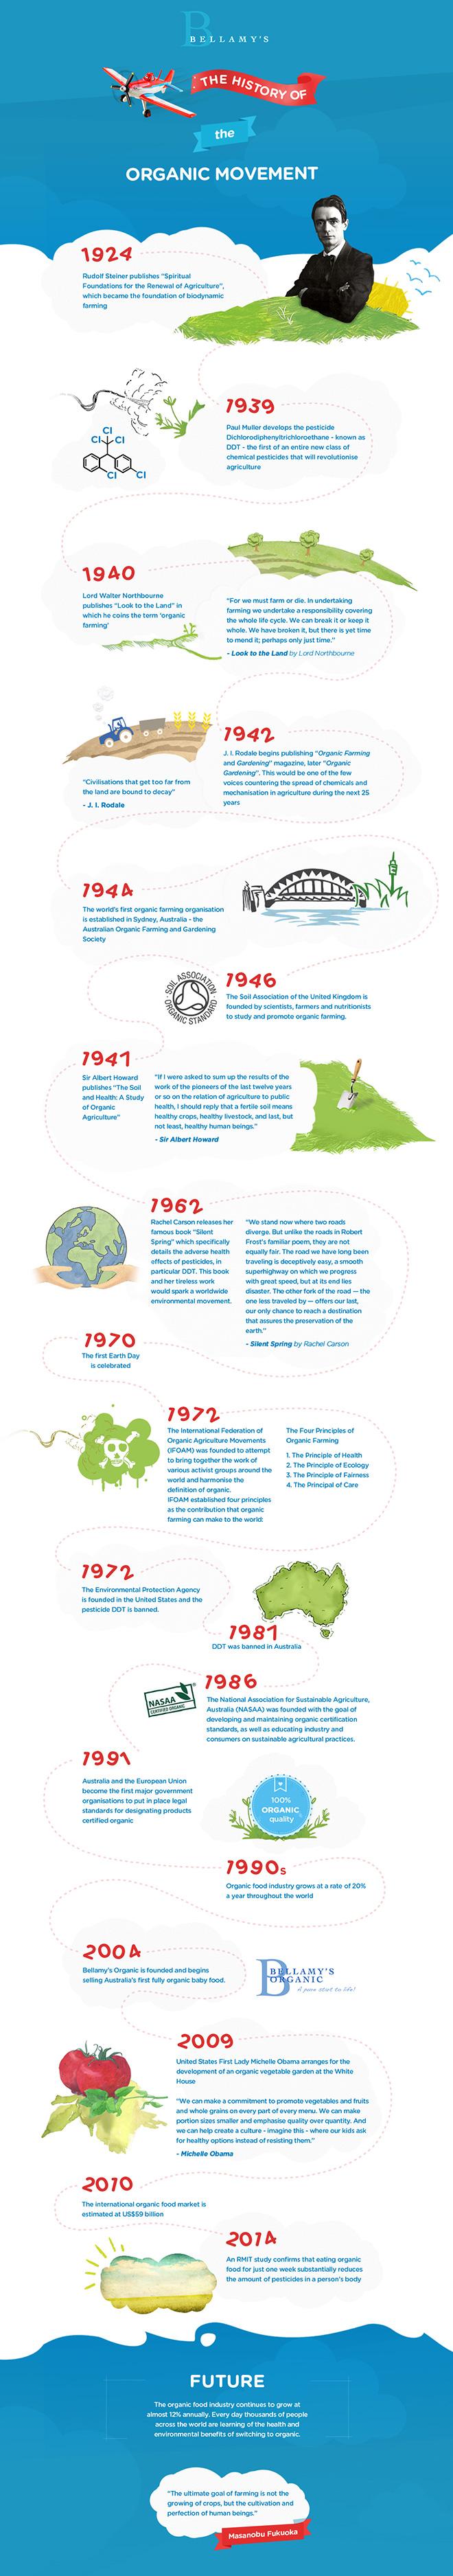 Bellamy's Organic Infographic